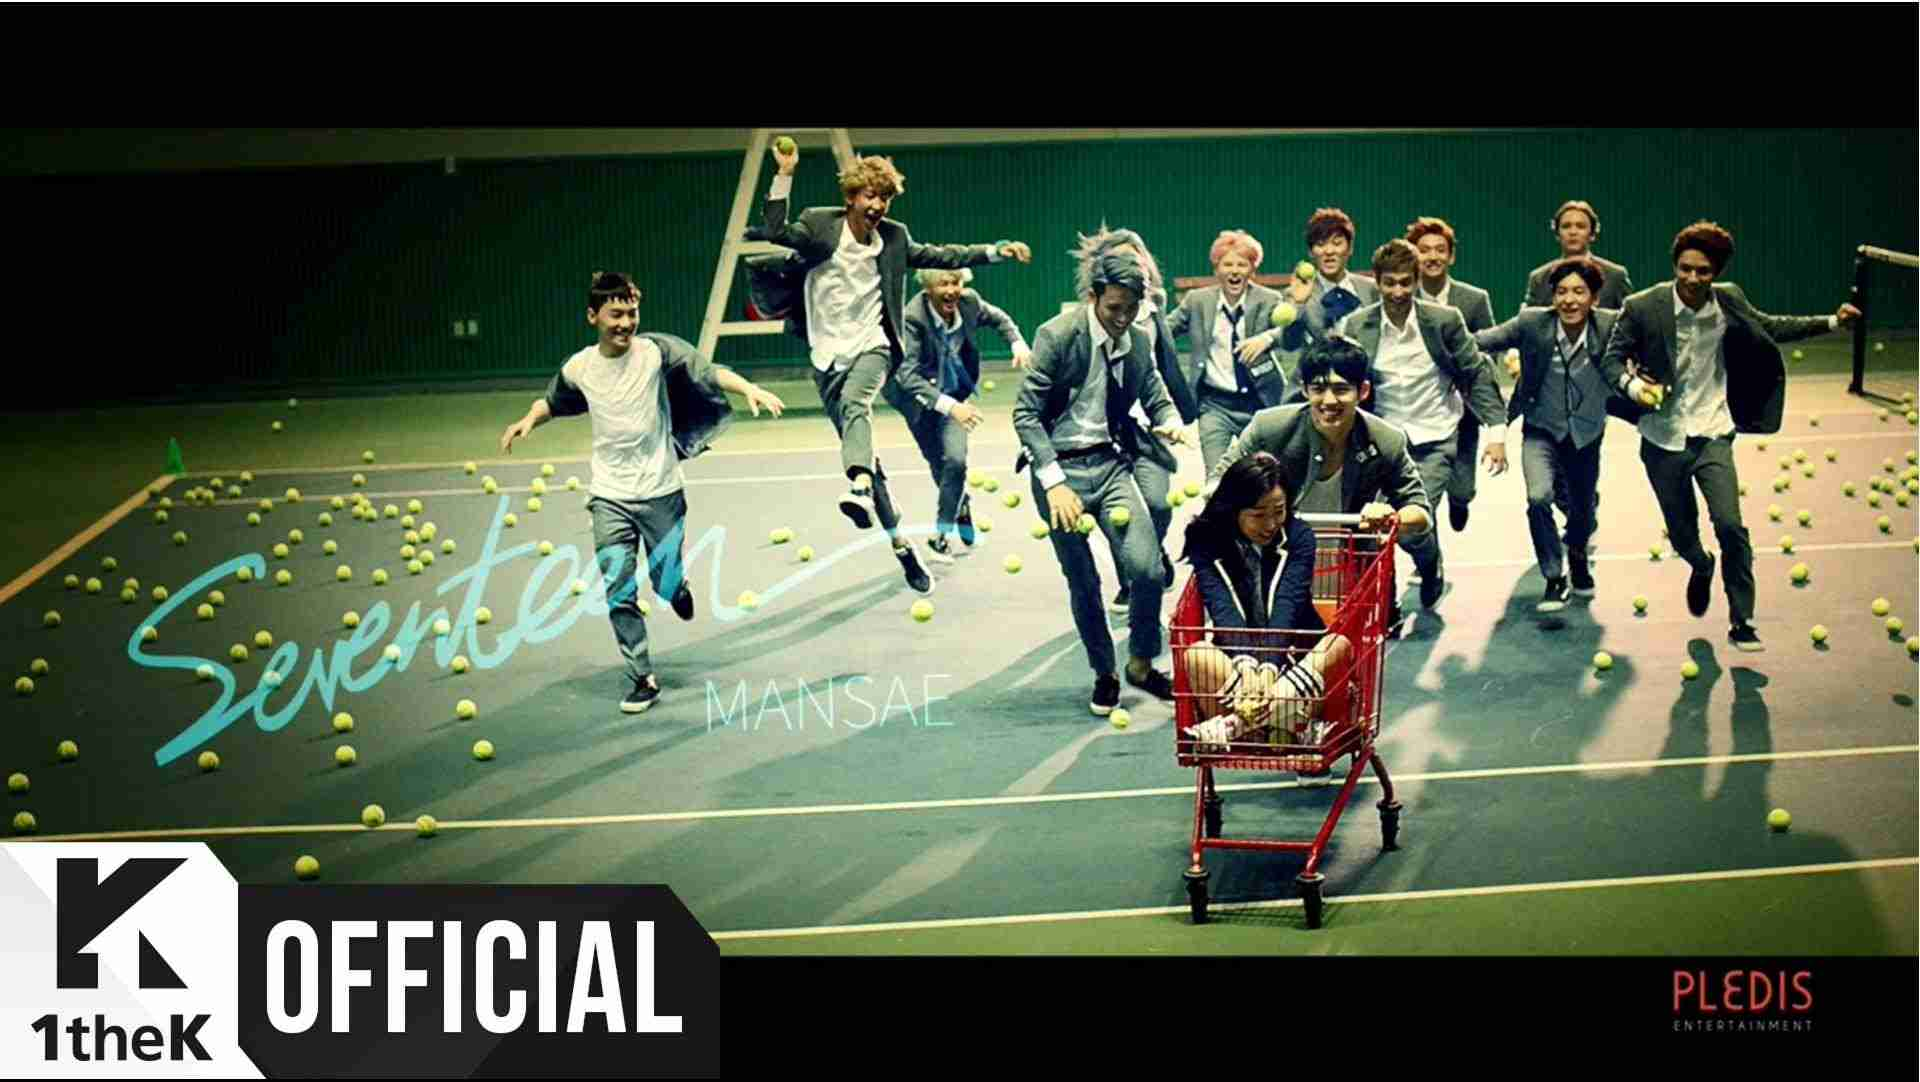 [MV] SEVENTEEN(세븐틴) _ Mansae(만세) - YouTube